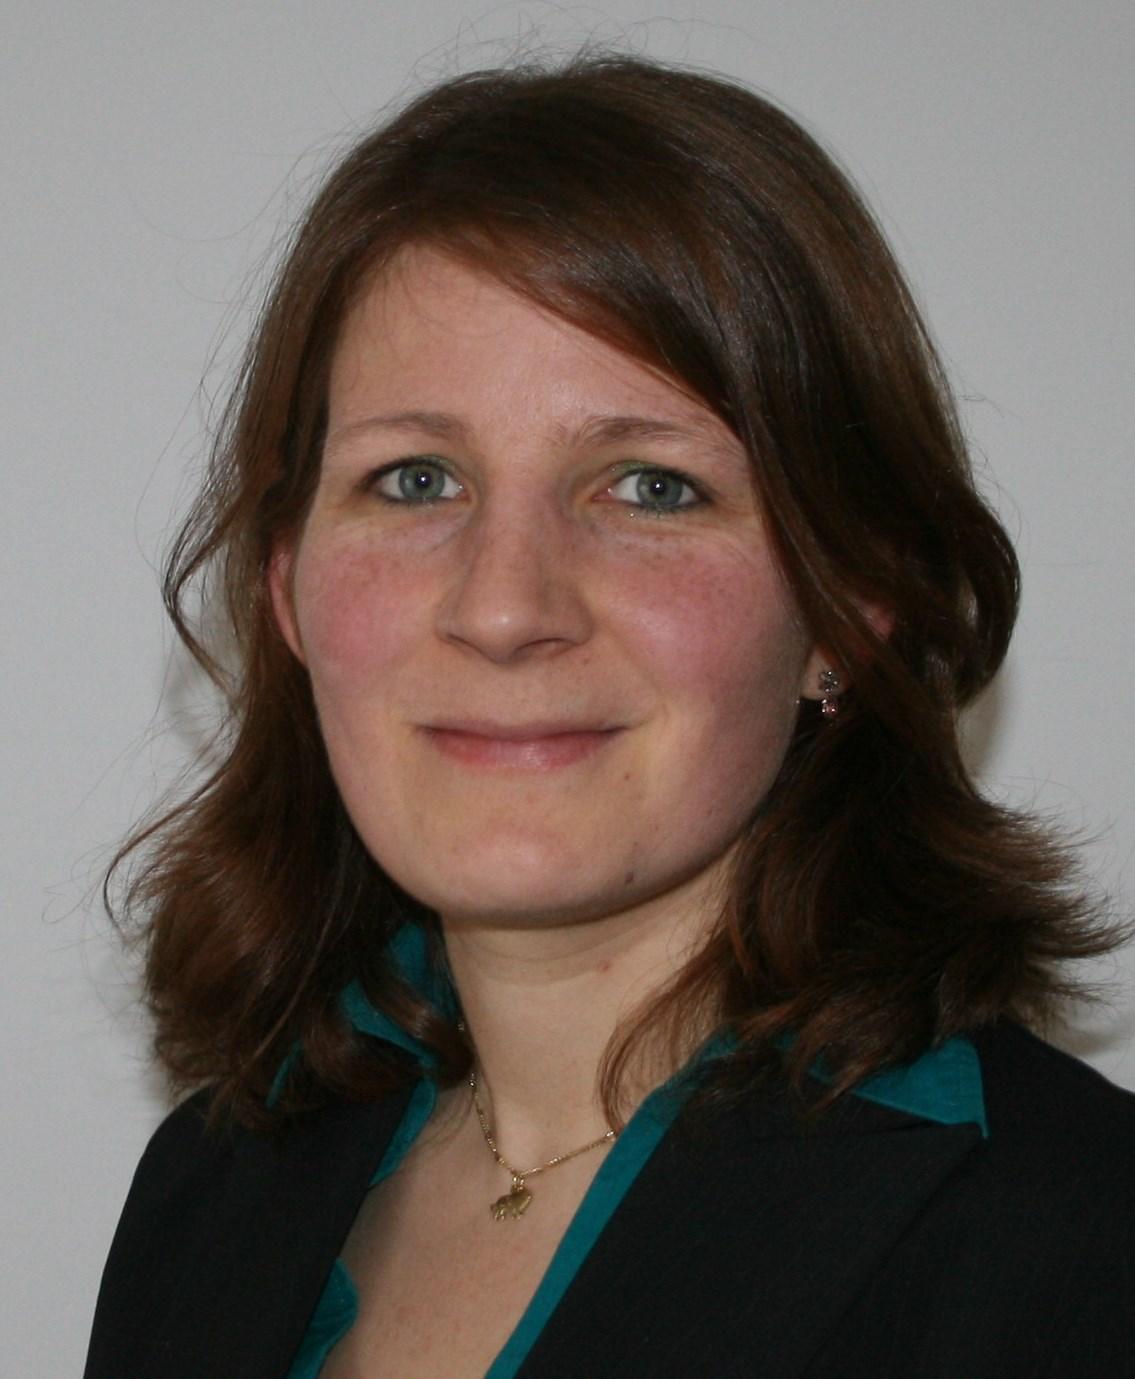 Marie-Elisabeth Heil